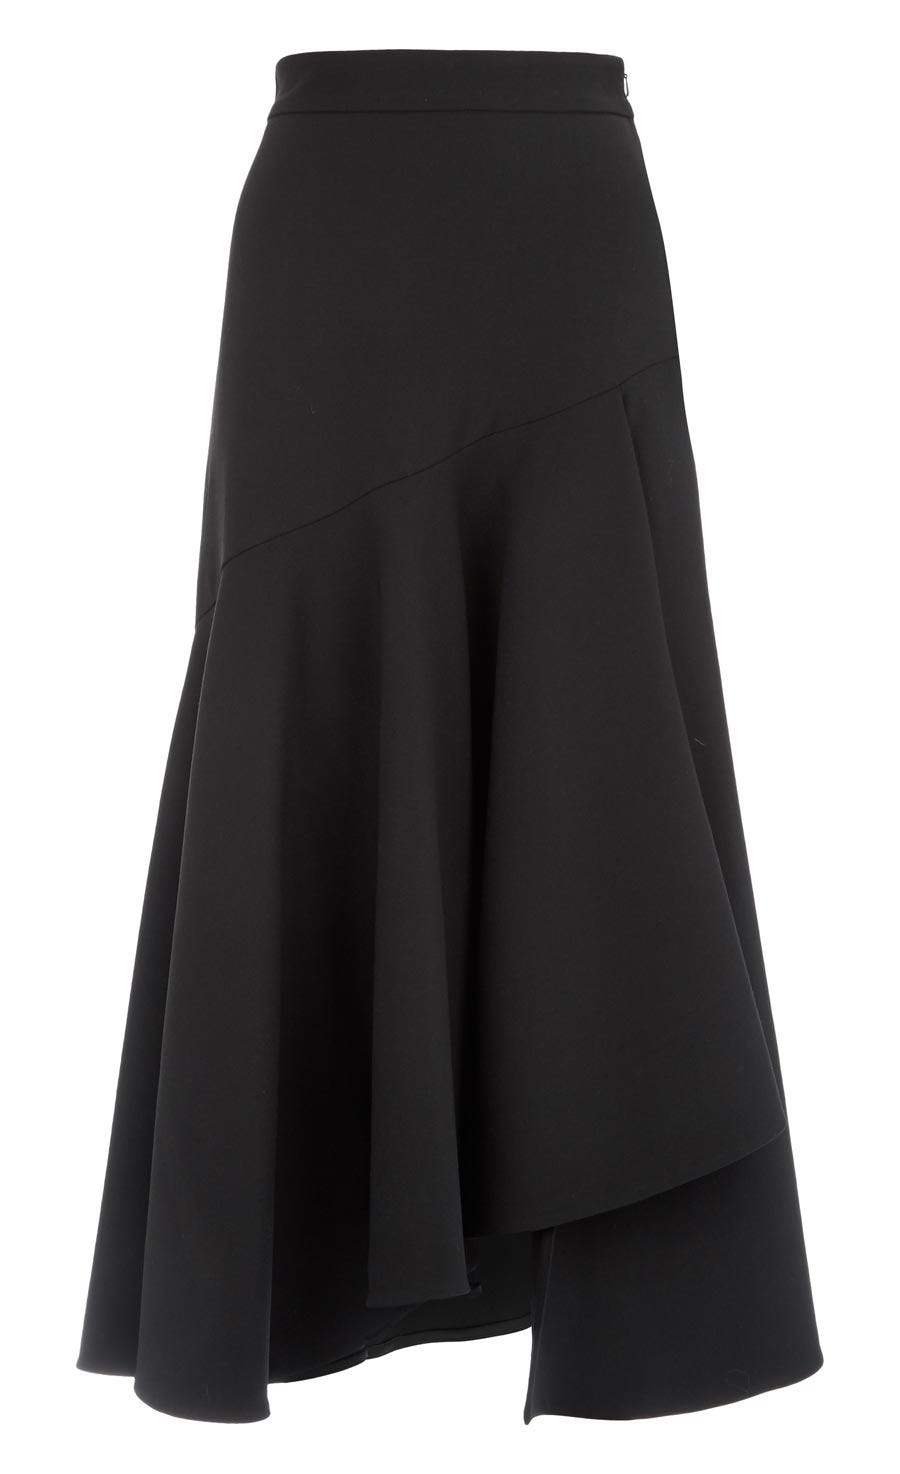 Mercury Plain Ruffle Skirt, Black